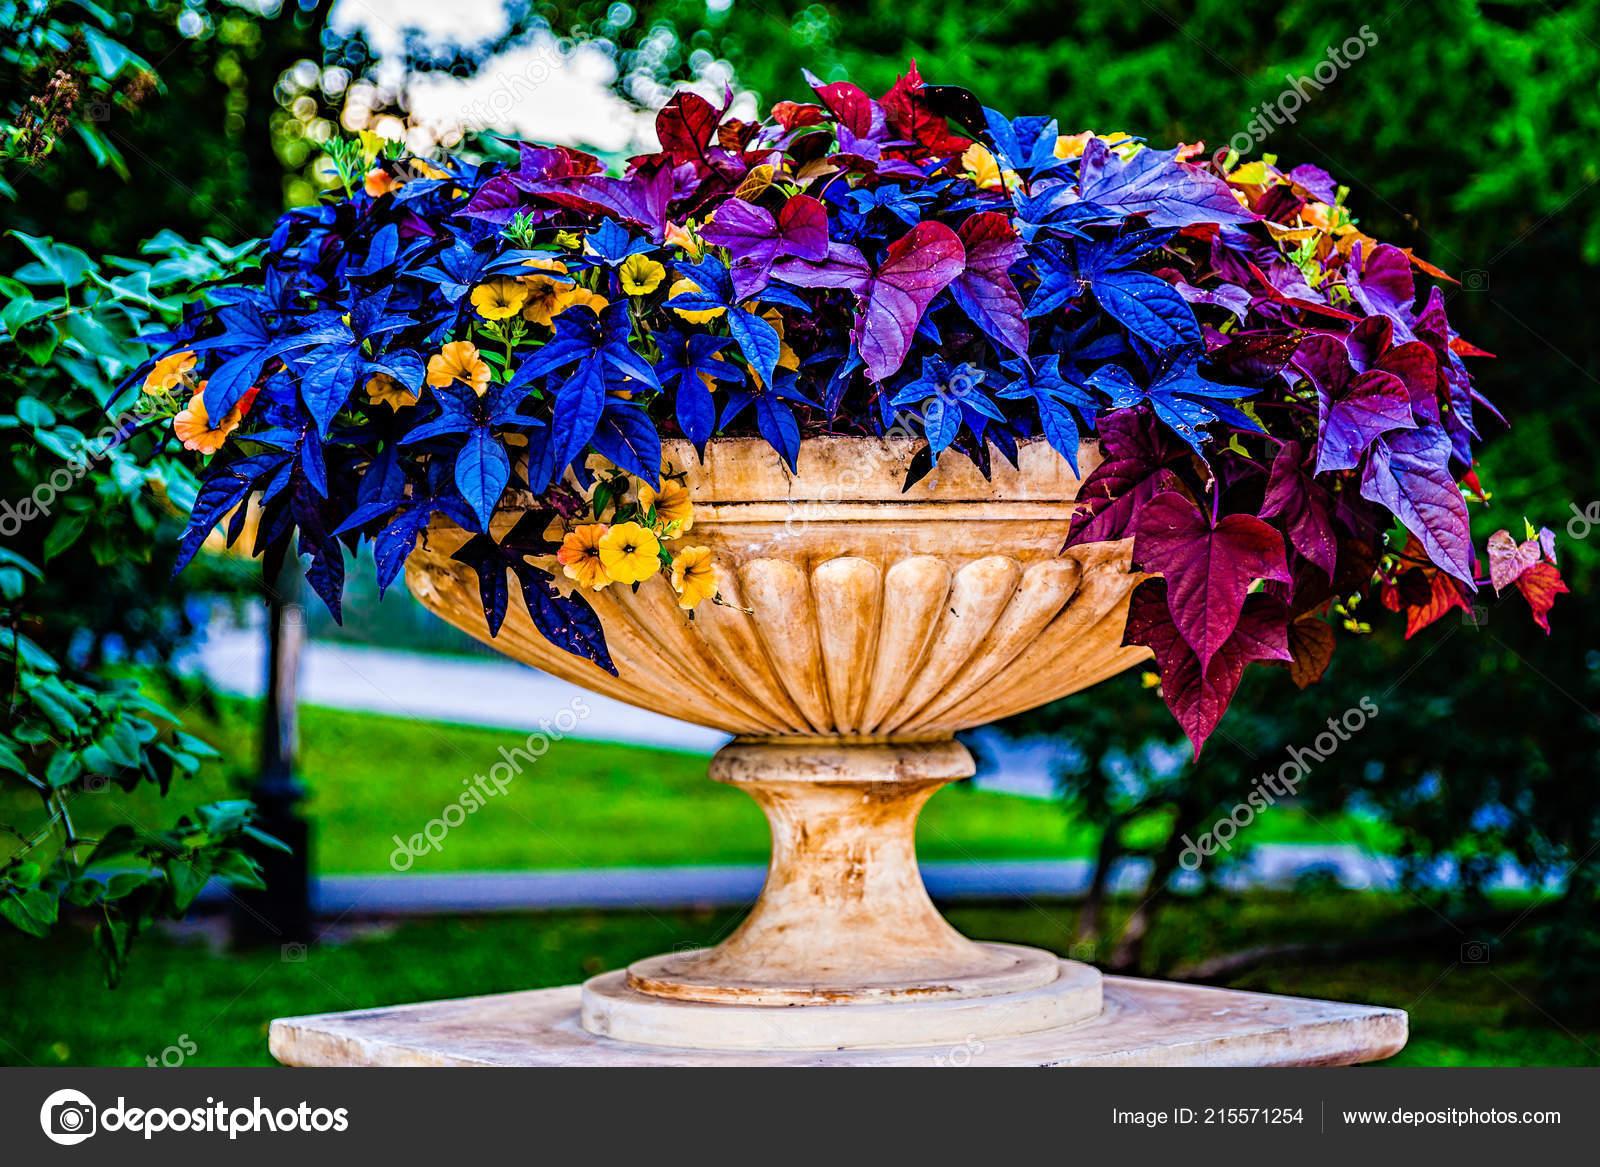 Decorative Park Urn Bowl Filled Beautiful Colorful Blue Violet